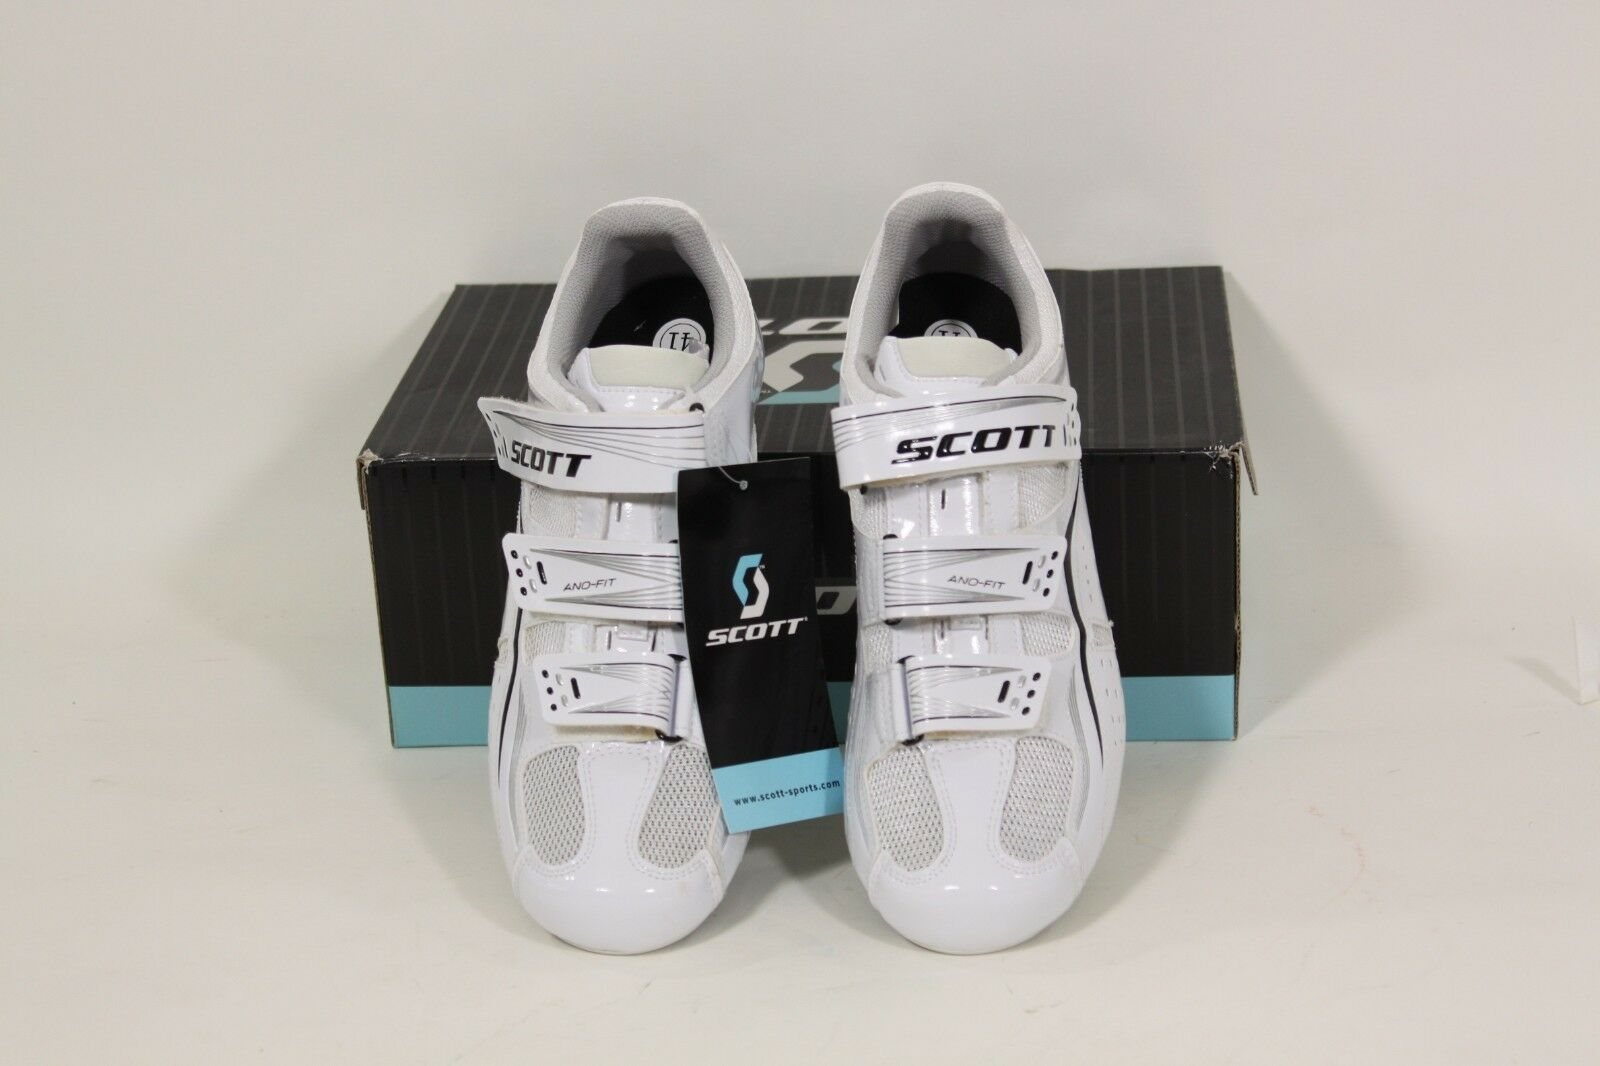 Scott Road Comp Lady Fahrrad Schuhe Weiß Gr. Eu 41 oder Us 9  | Haltbarer Service